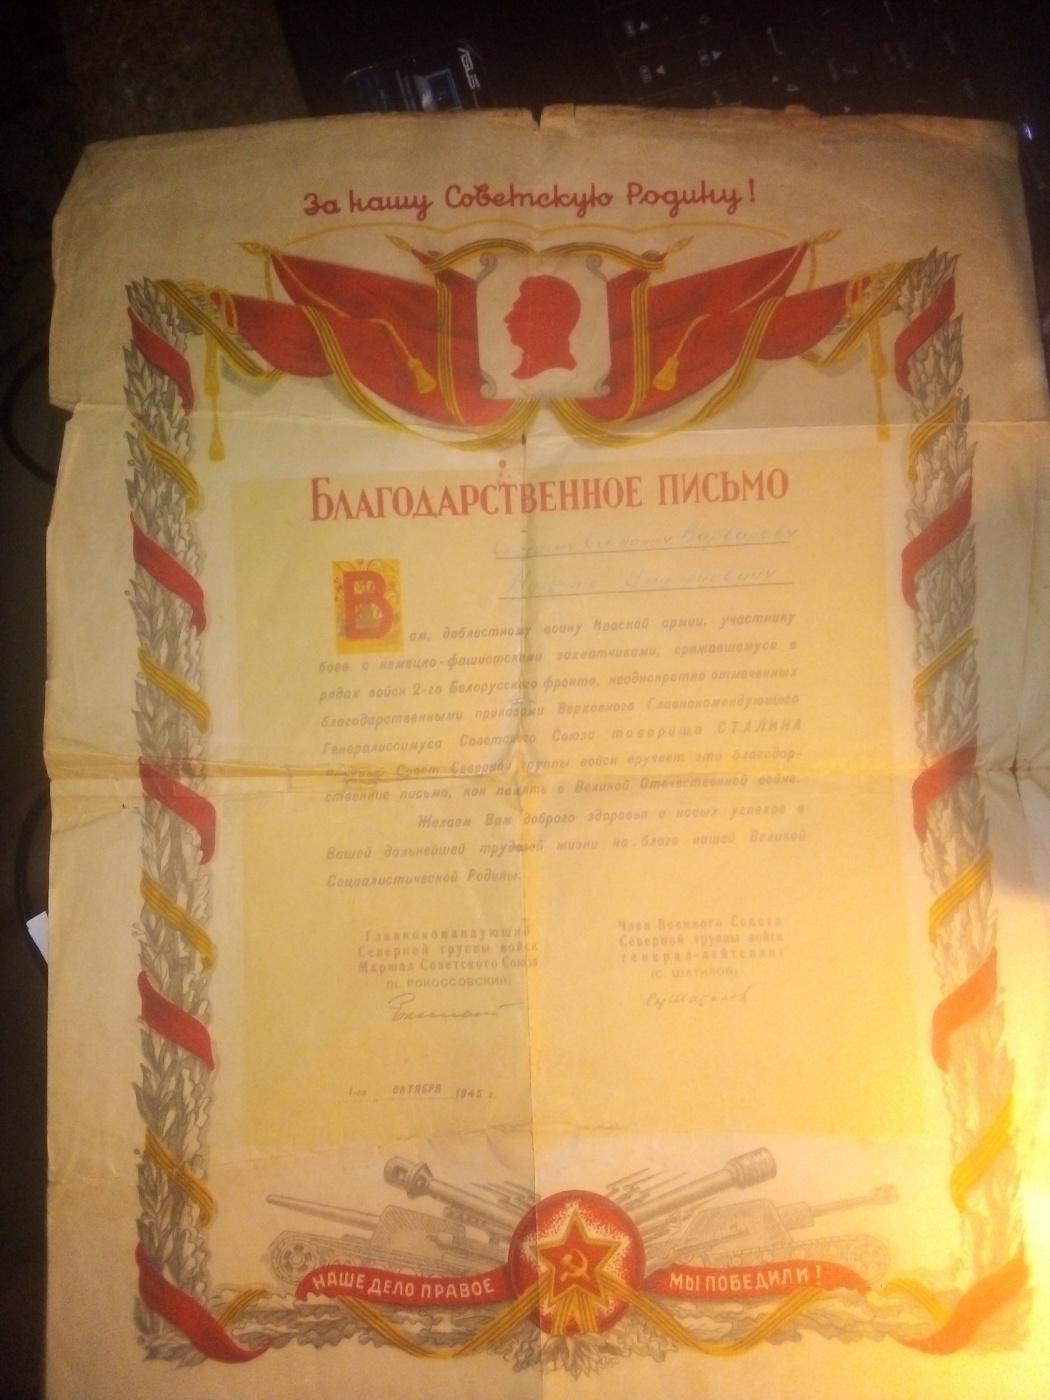 Rokasovsky. Diploma